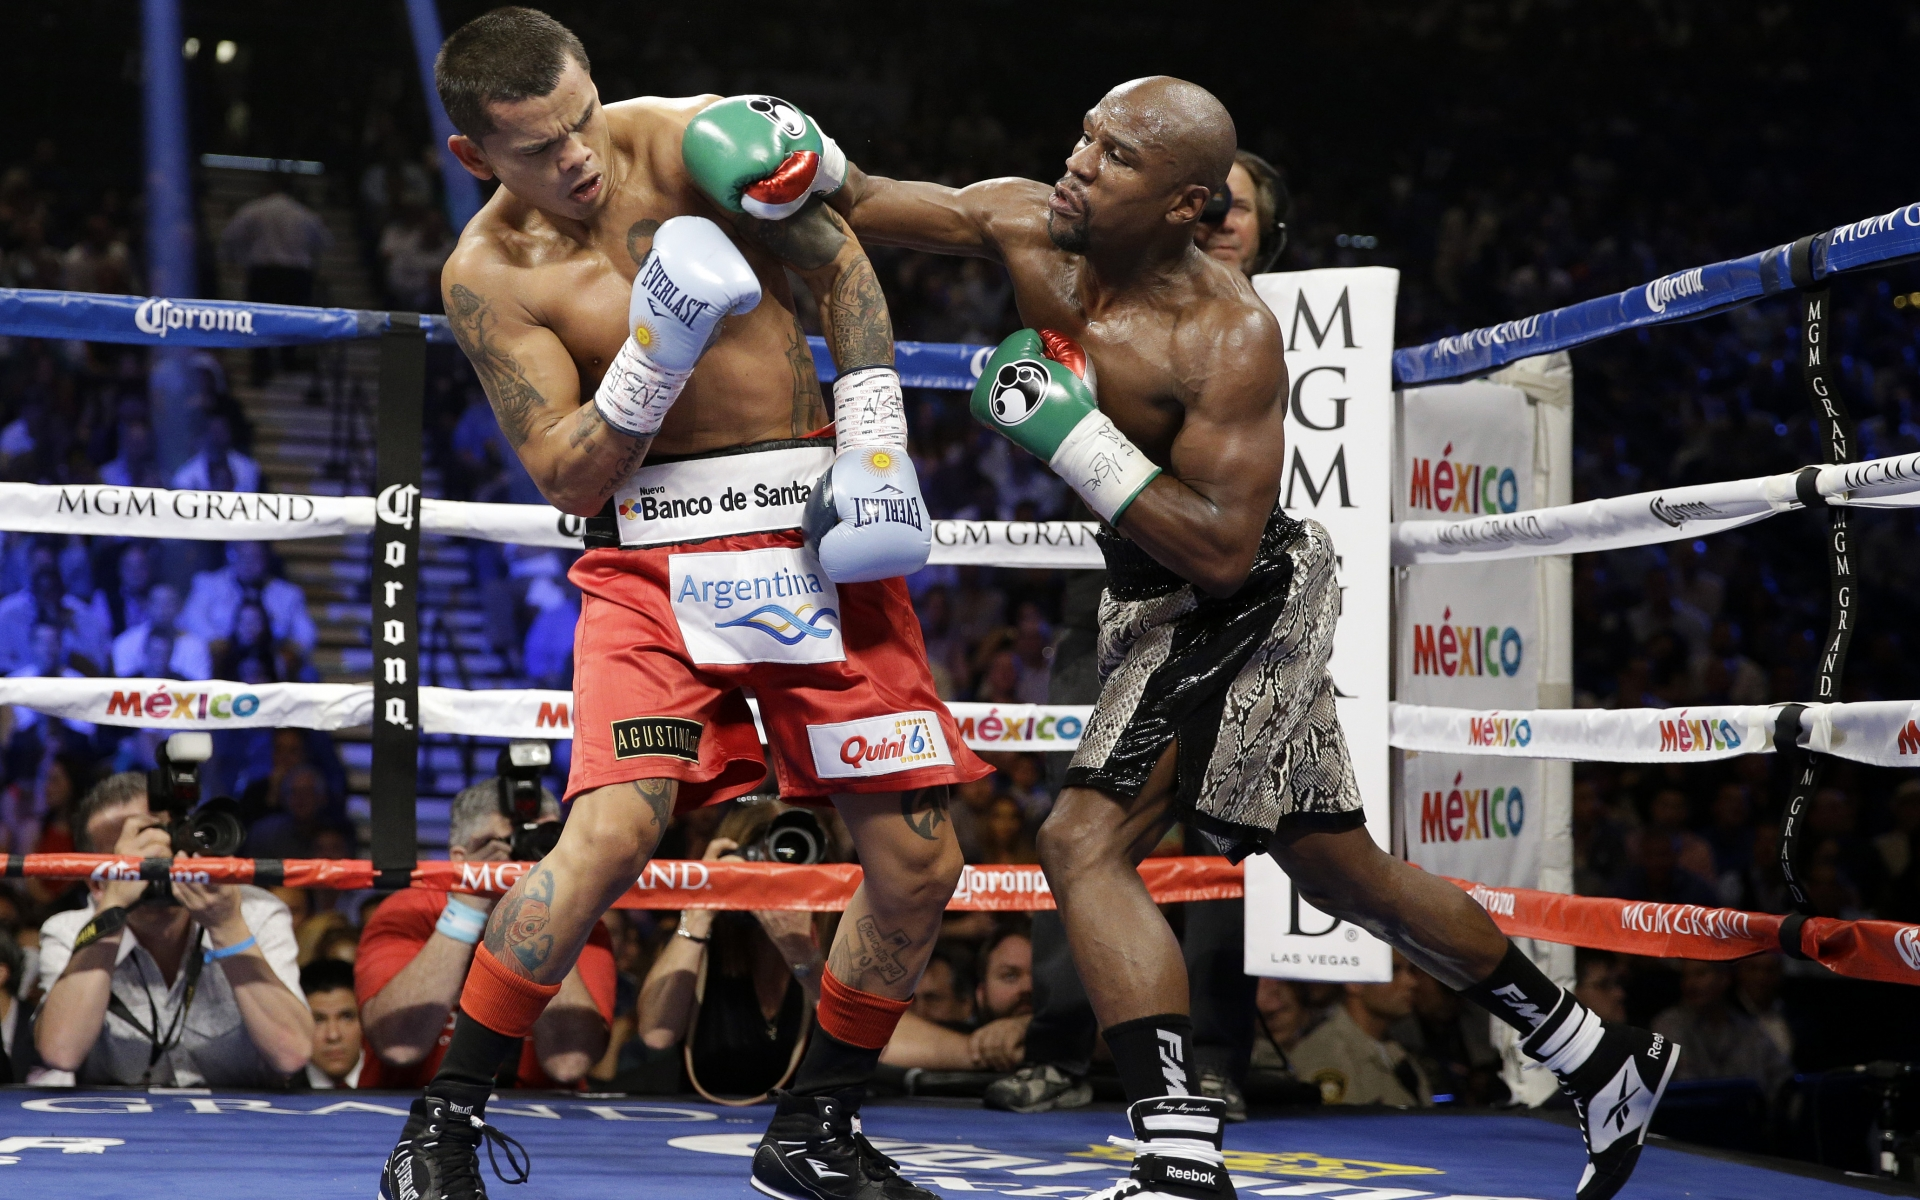 Floyd Mayweather peleando - 1920x1200